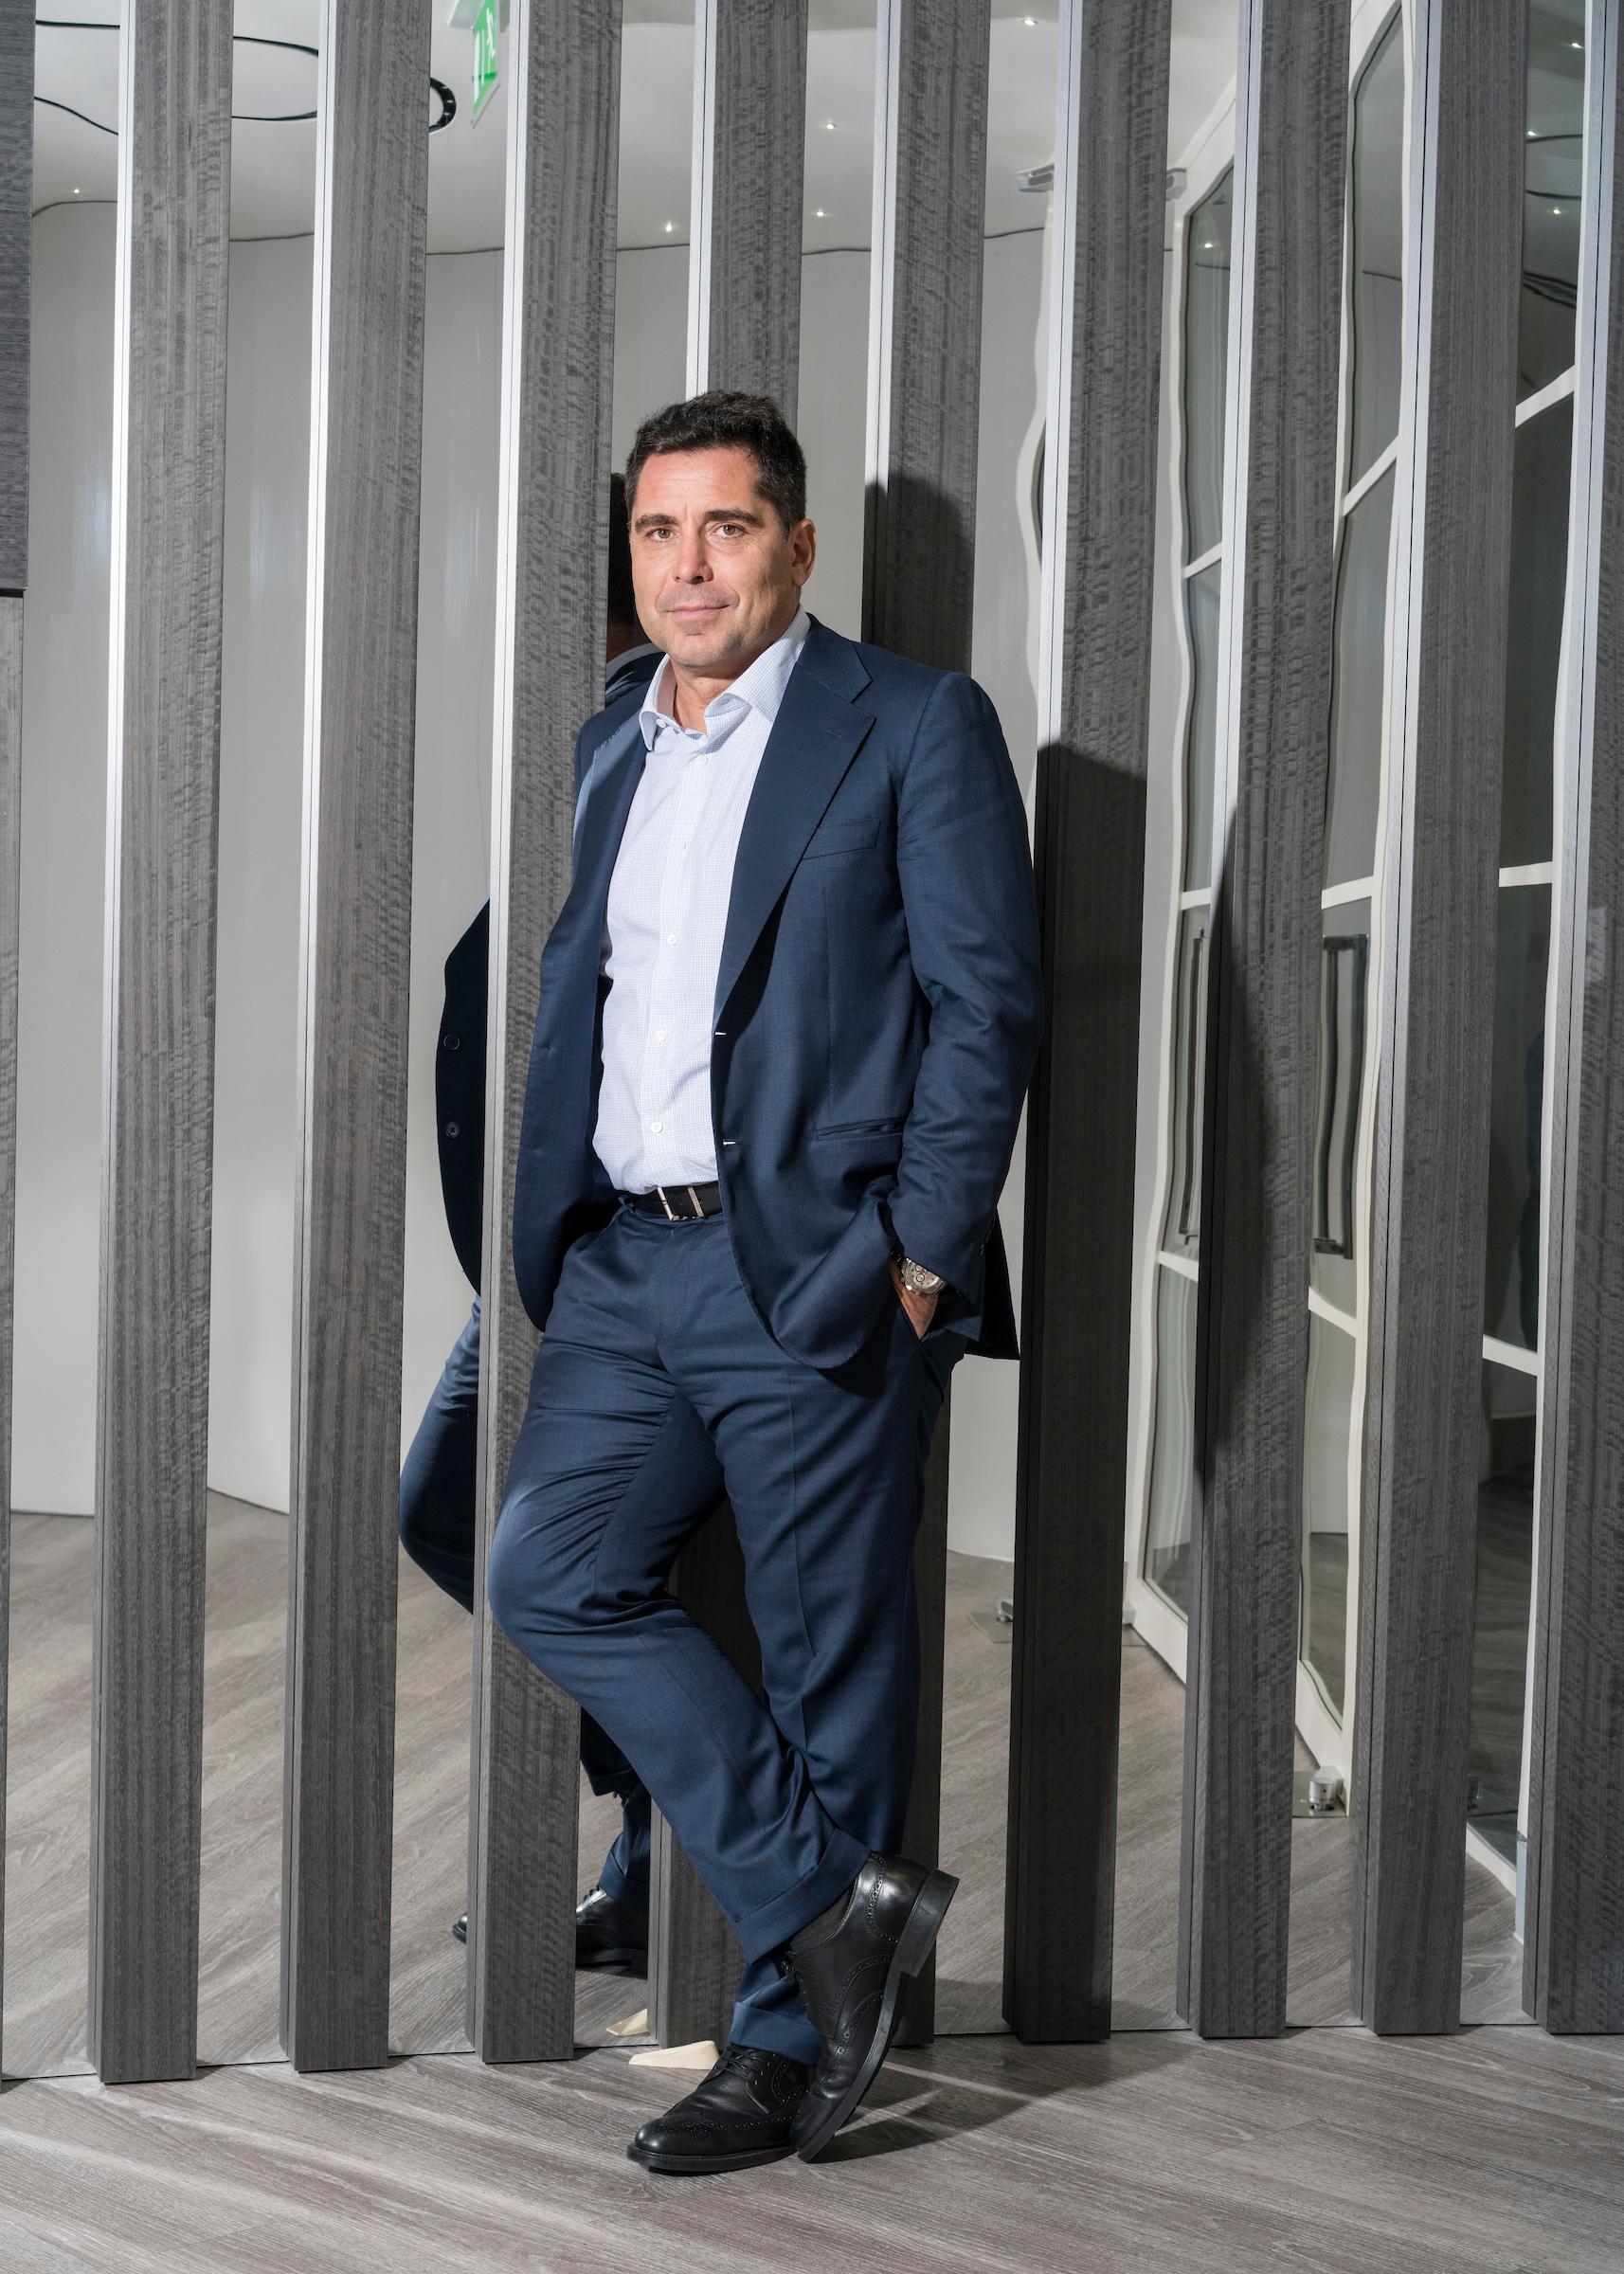 Riccardo Silva at Silva International Investments' London Office